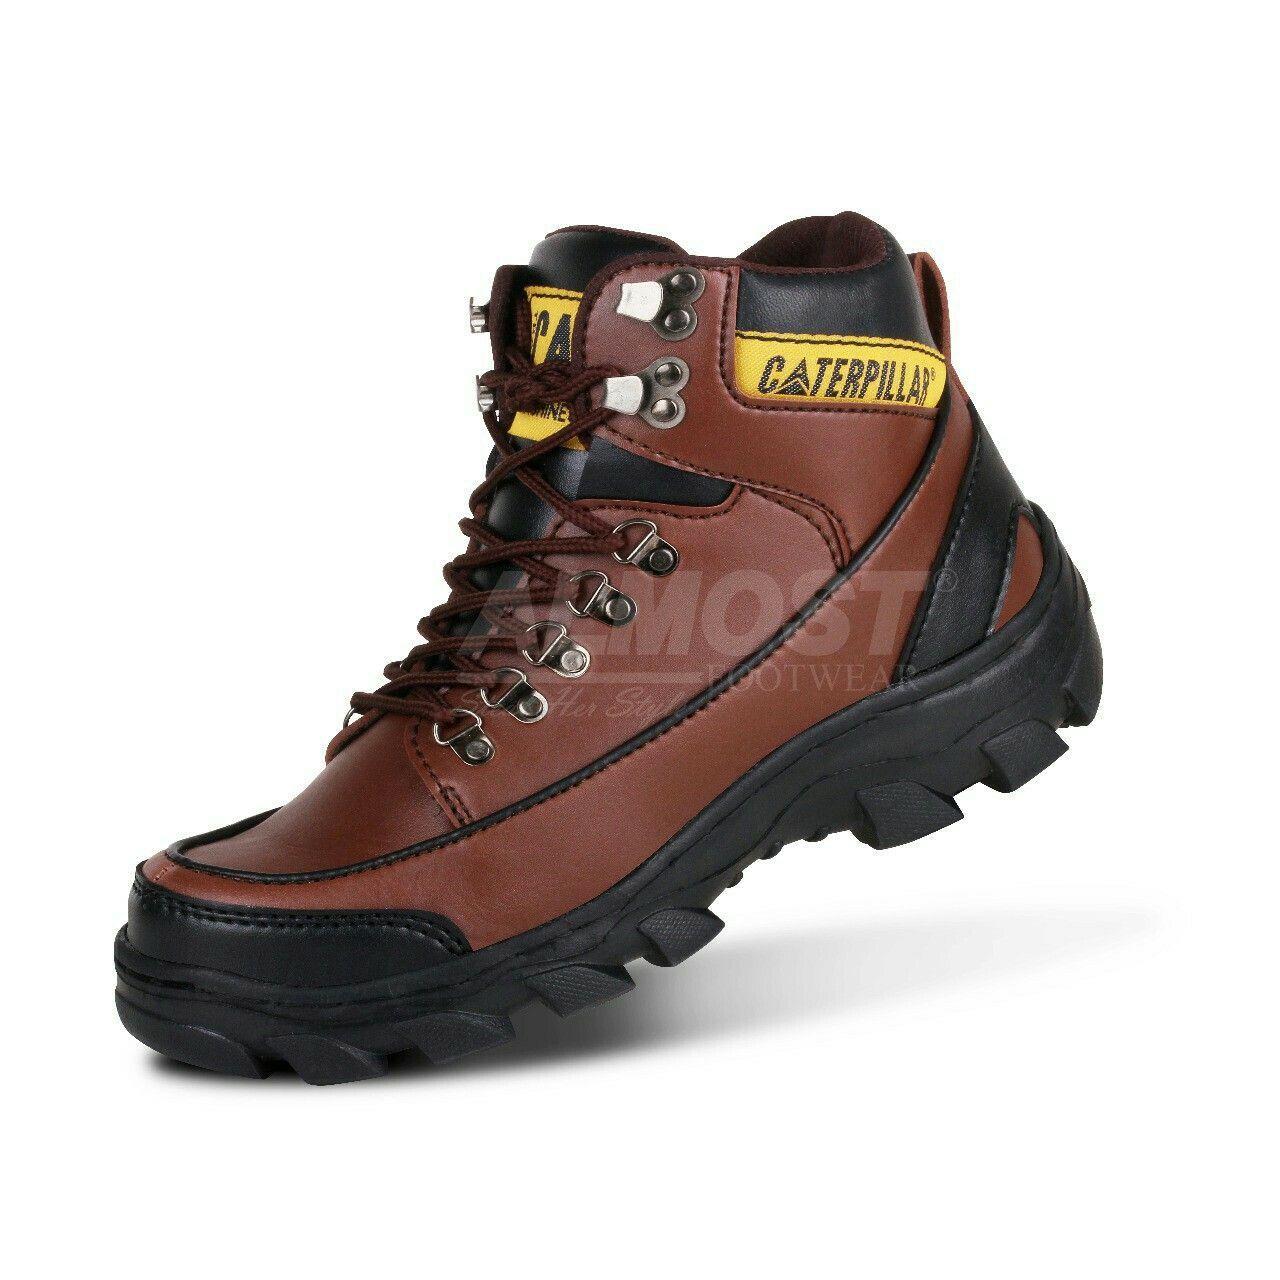 Sepatu Boots Safety ujung besi original bandung cibaduyut crocodile kickers almost catterpilar Tan cream abu